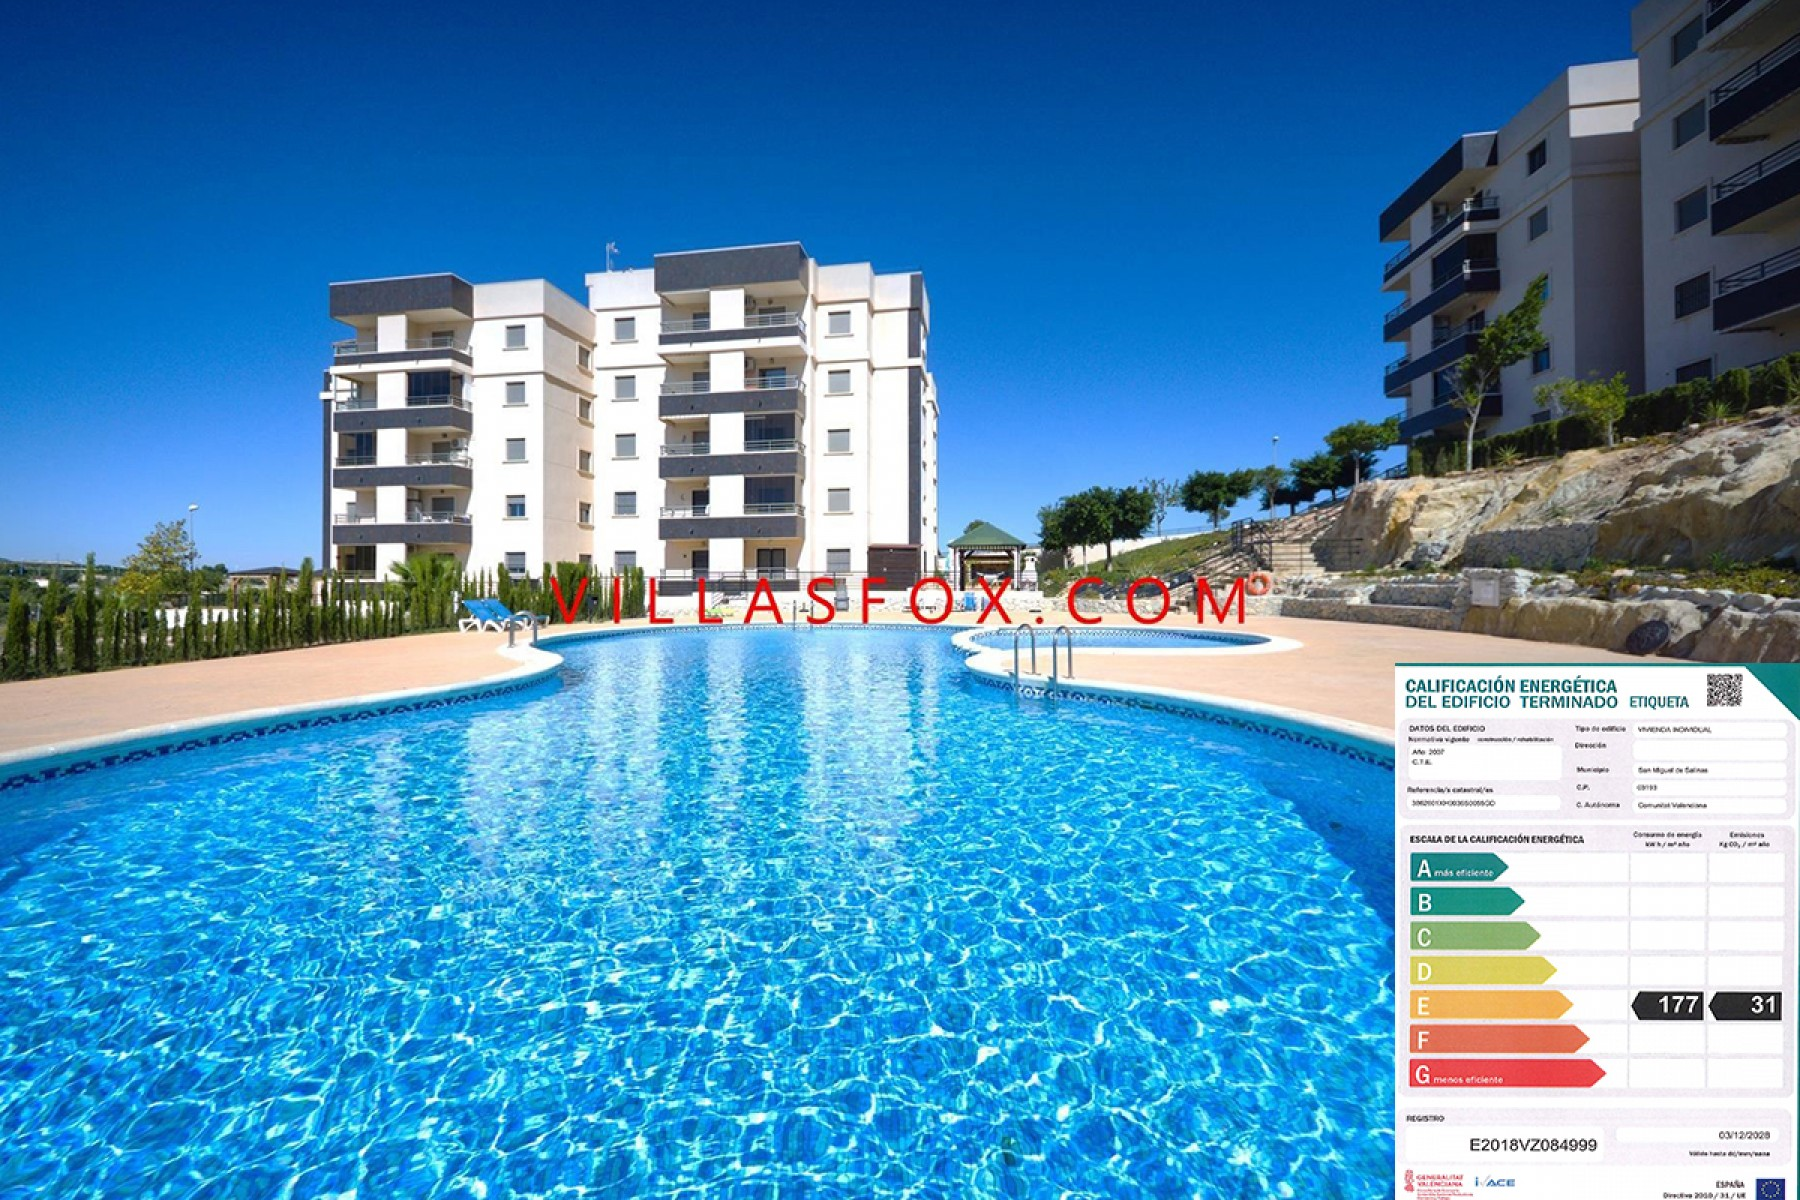 2-bedroom apartment with glazed terrace, pool, views, San Miguel de Salinas